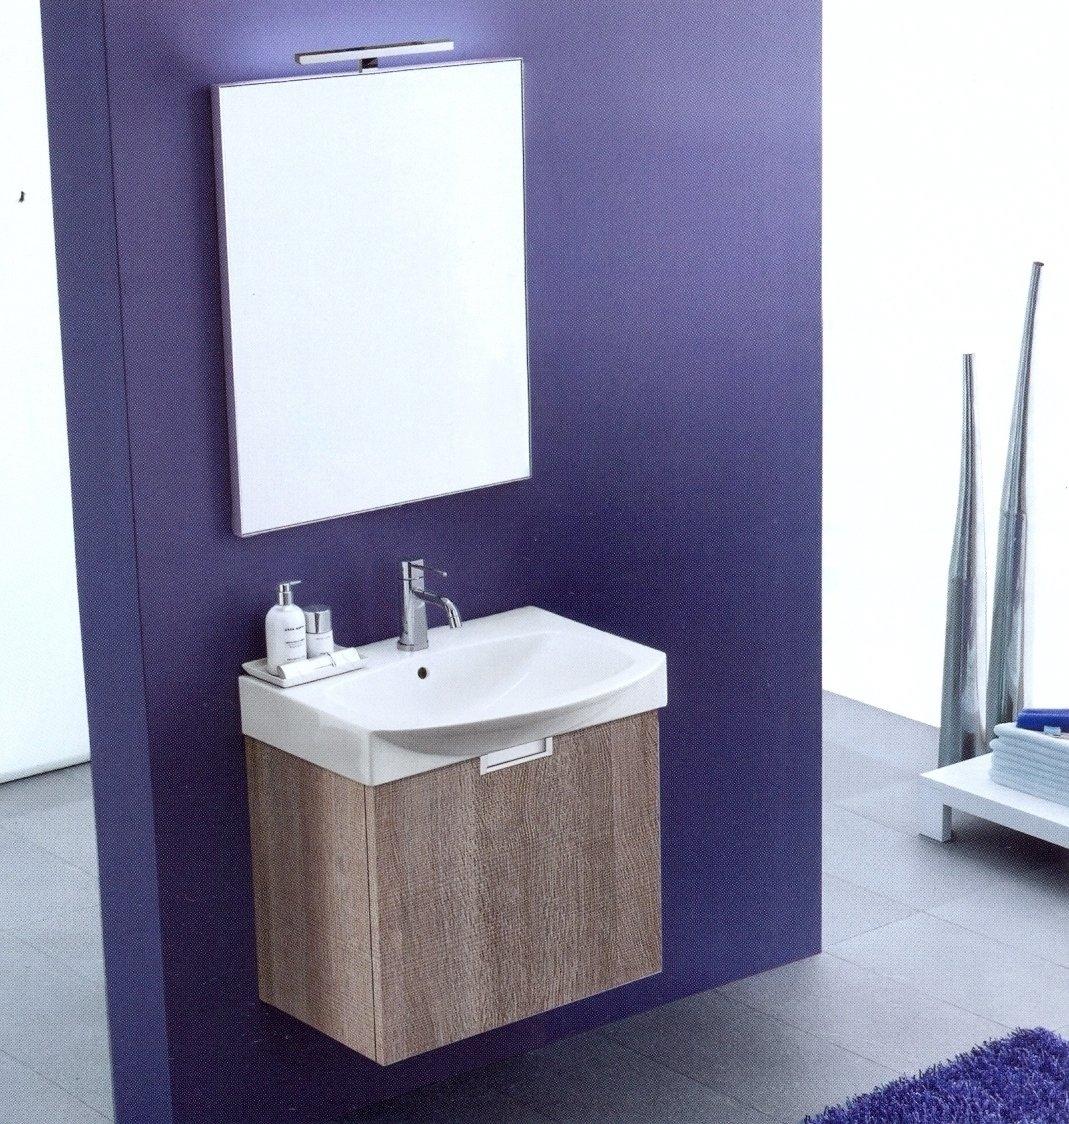 Catalogo mobili bagno affordable mobili bagno ikea with catalogo mobili bagno fabulous sono le - Mobili bagno arbi prezzi ...